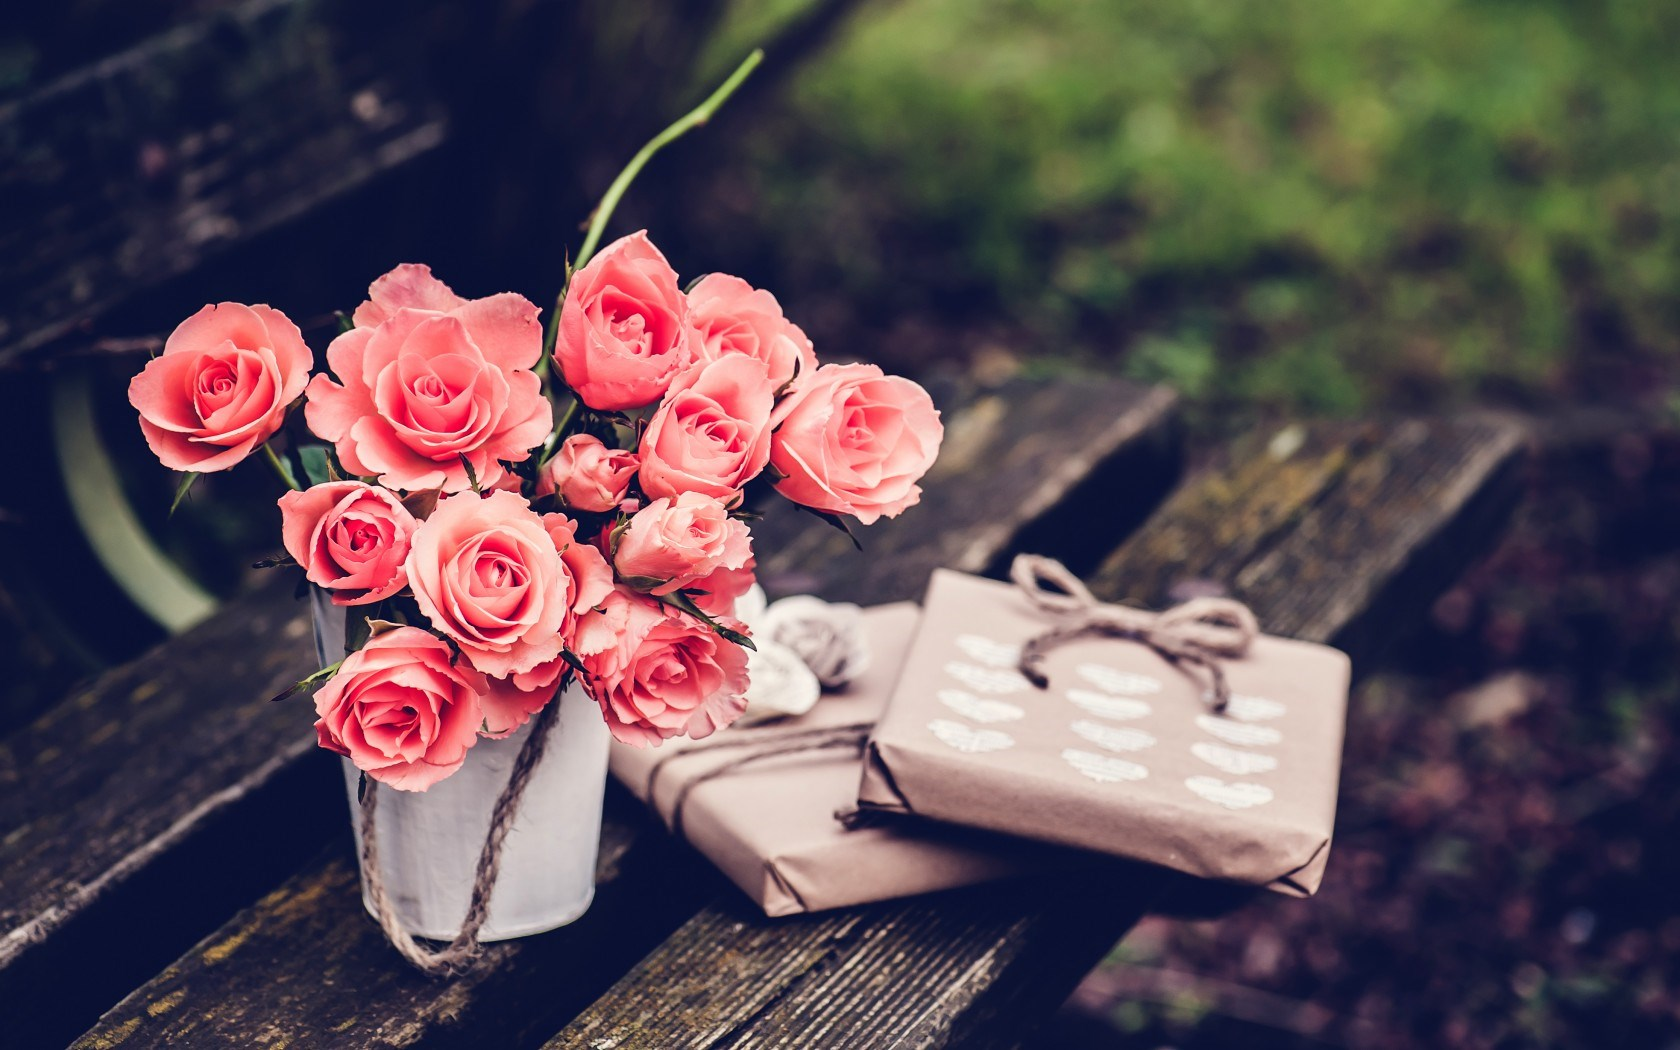 Pink flower wallpaper tumblr mightylinksfo Images